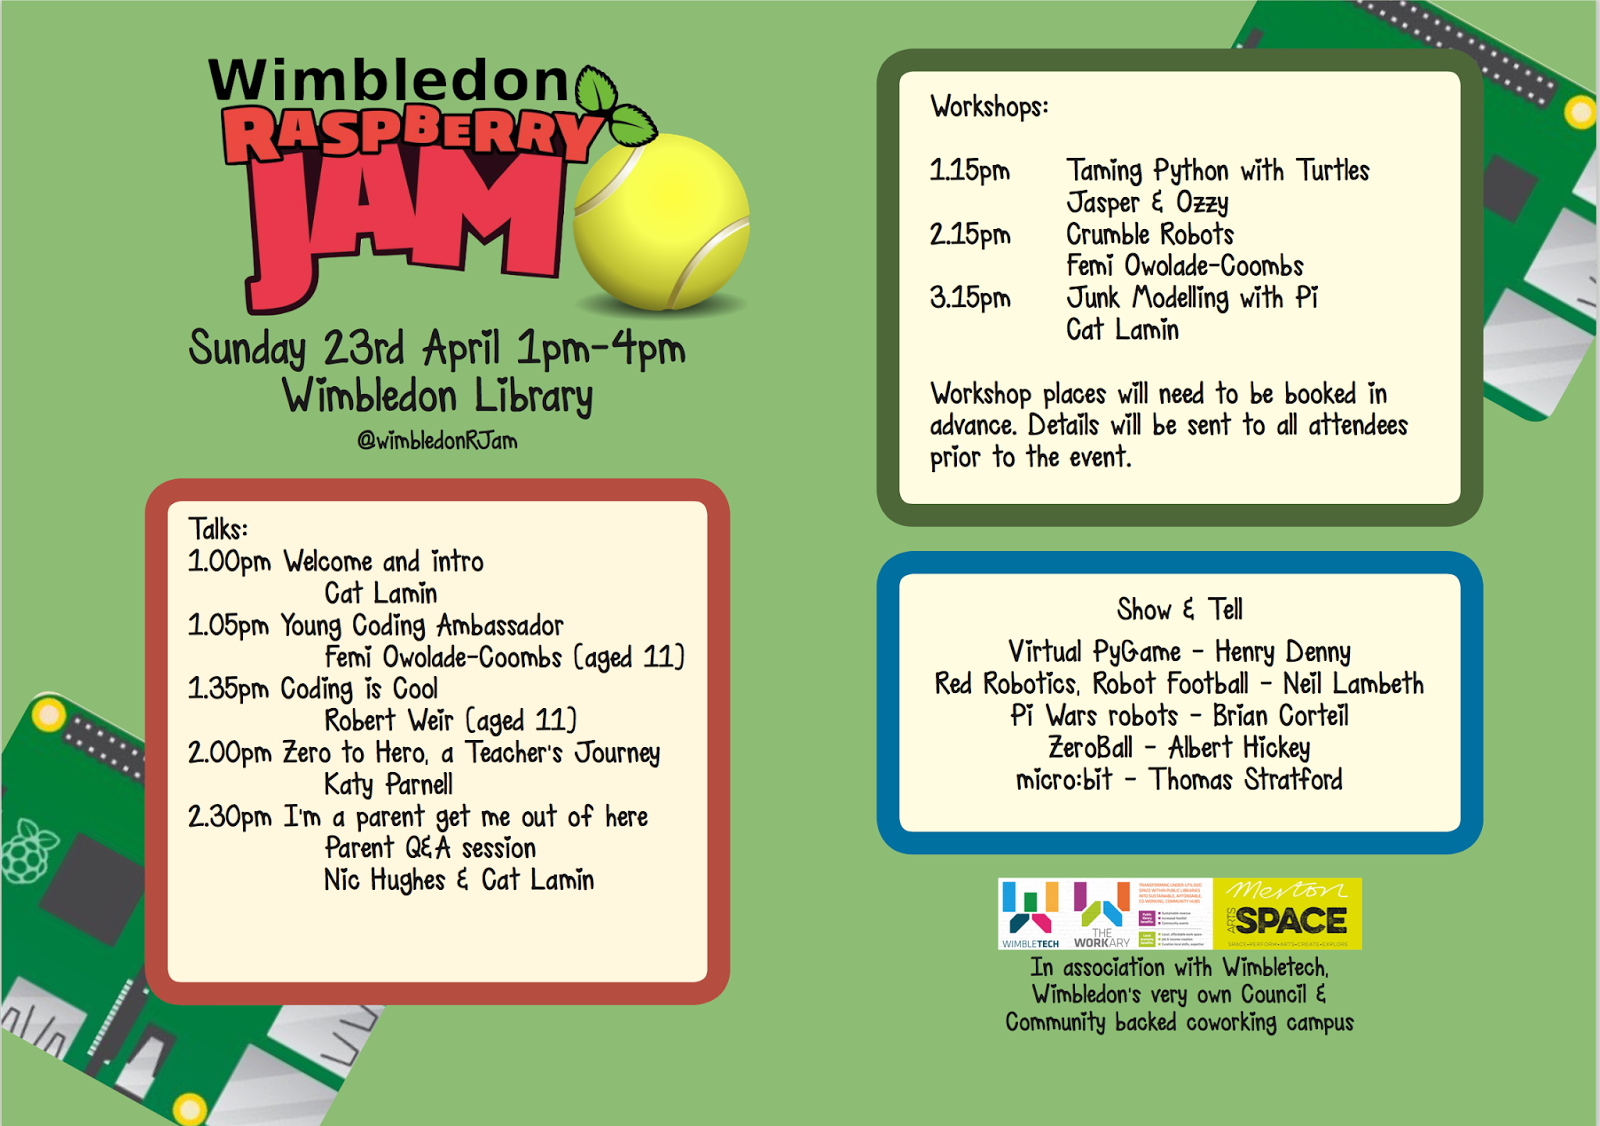 3rd Wimbledon Raspberry Jam Agenda